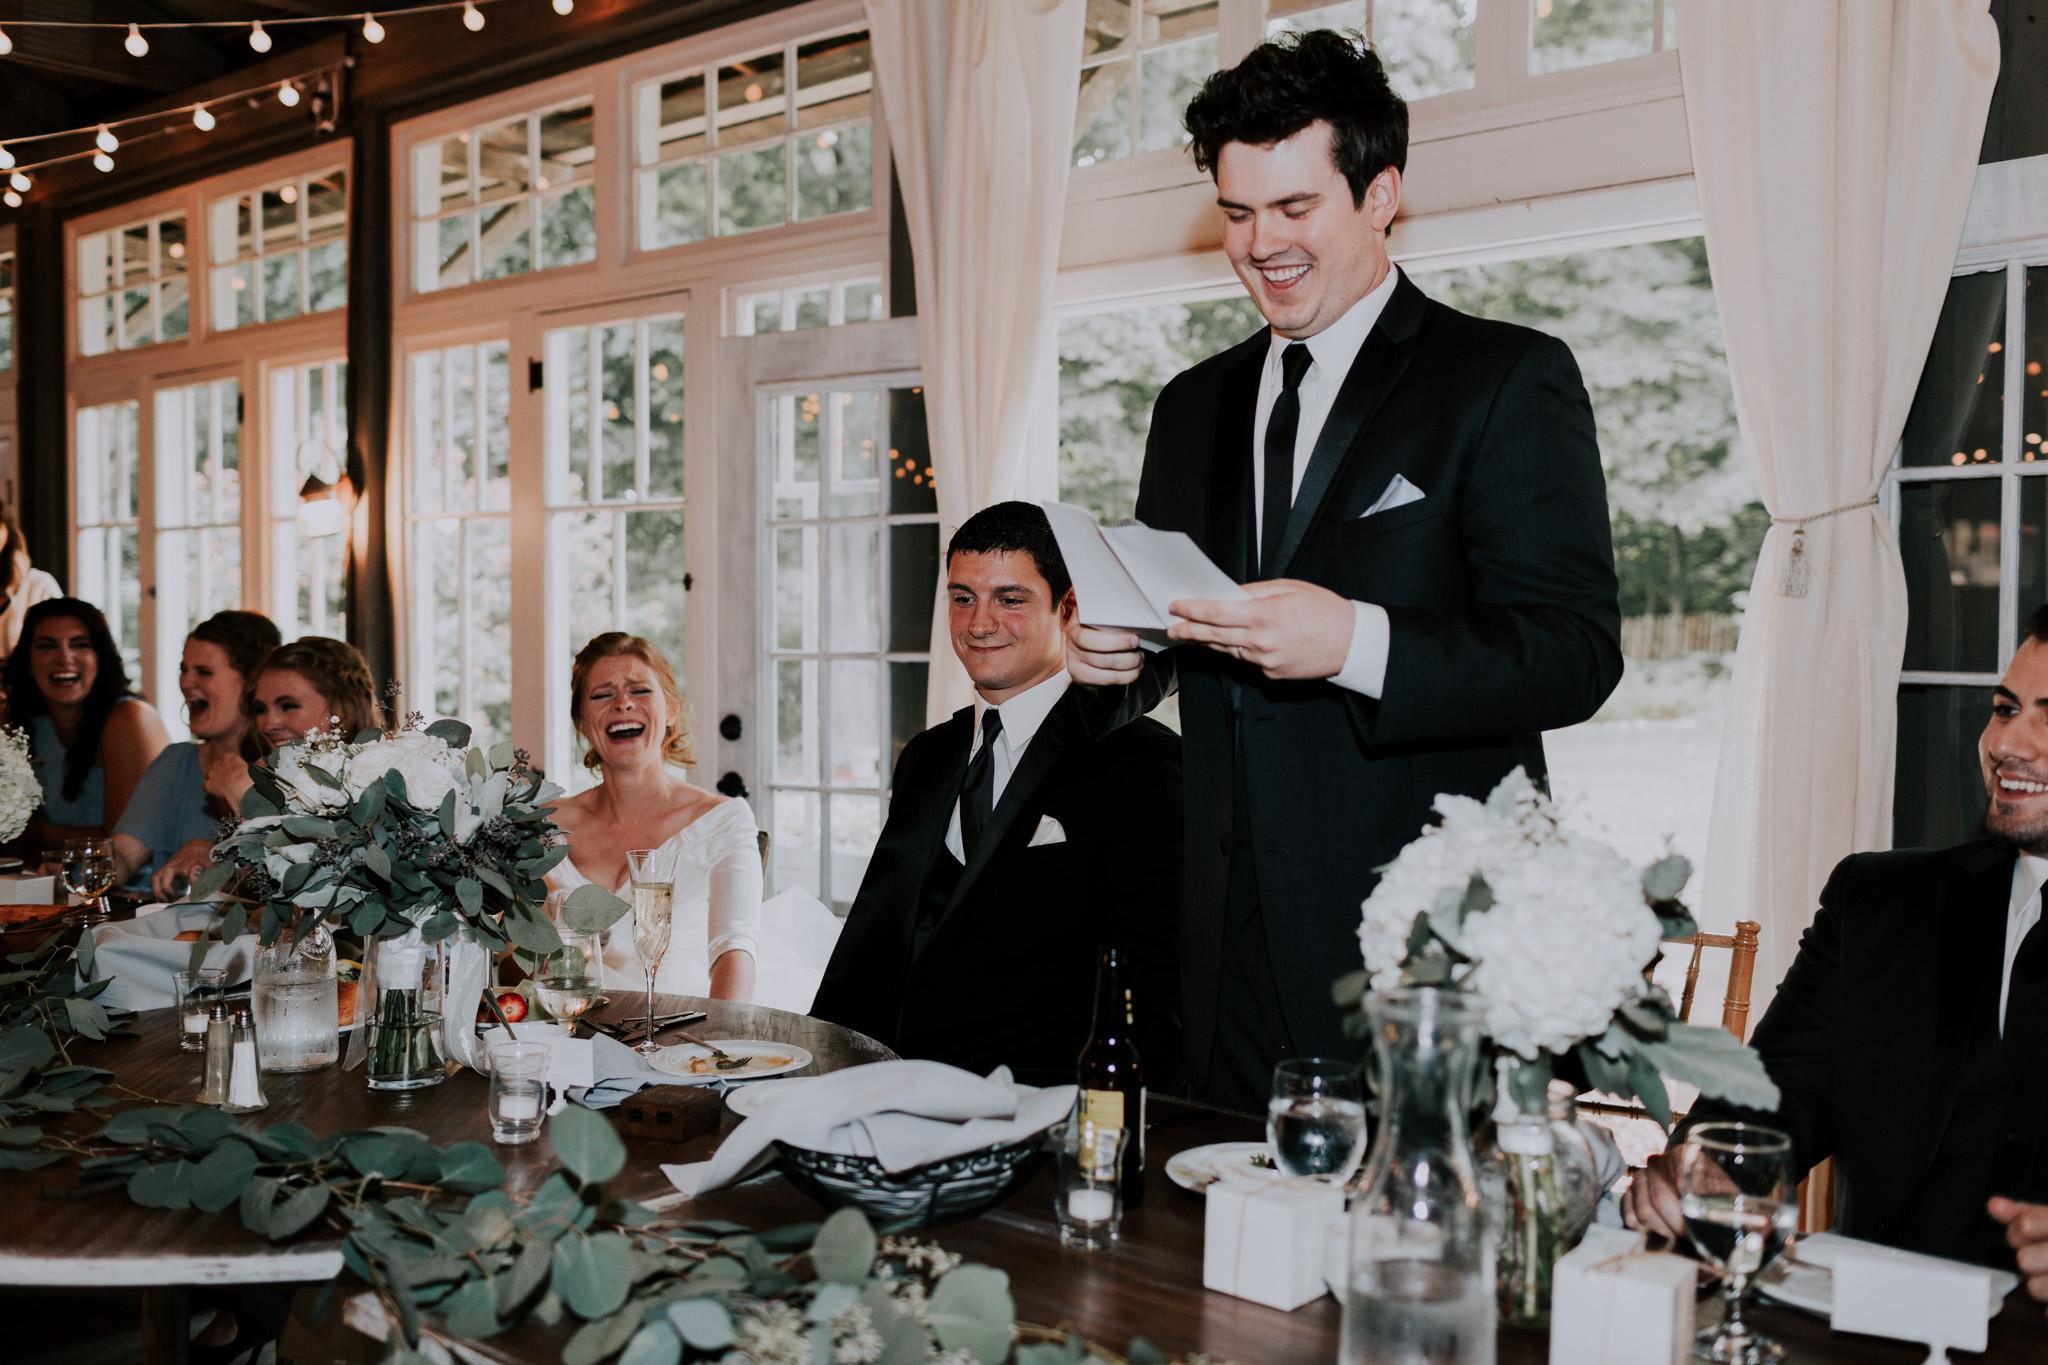 MillCreek-Wilde-Wedding-Barn-Michigan-Eliza-Eric-Vafa-Photo999.jpg